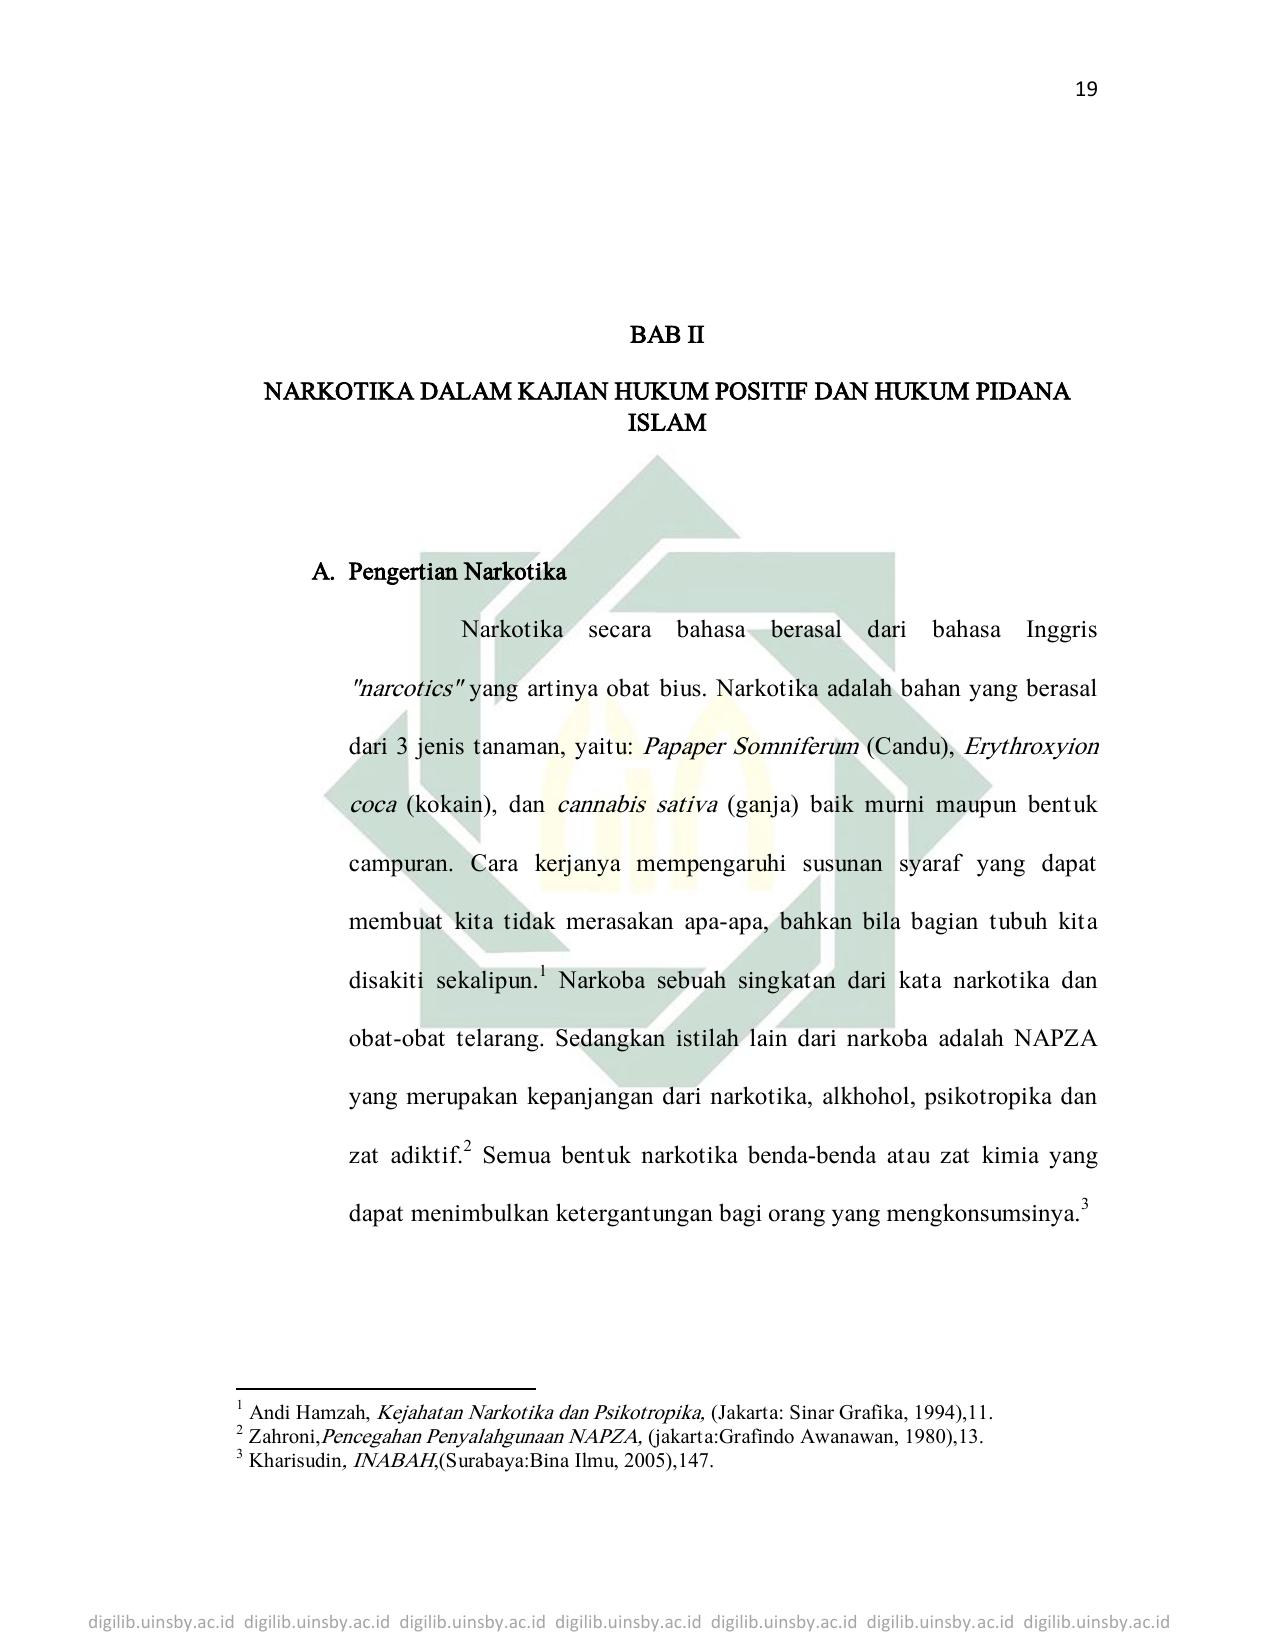 Bab Ii Narkotika Dalam Kajian Hukum Positif Dan Hukum